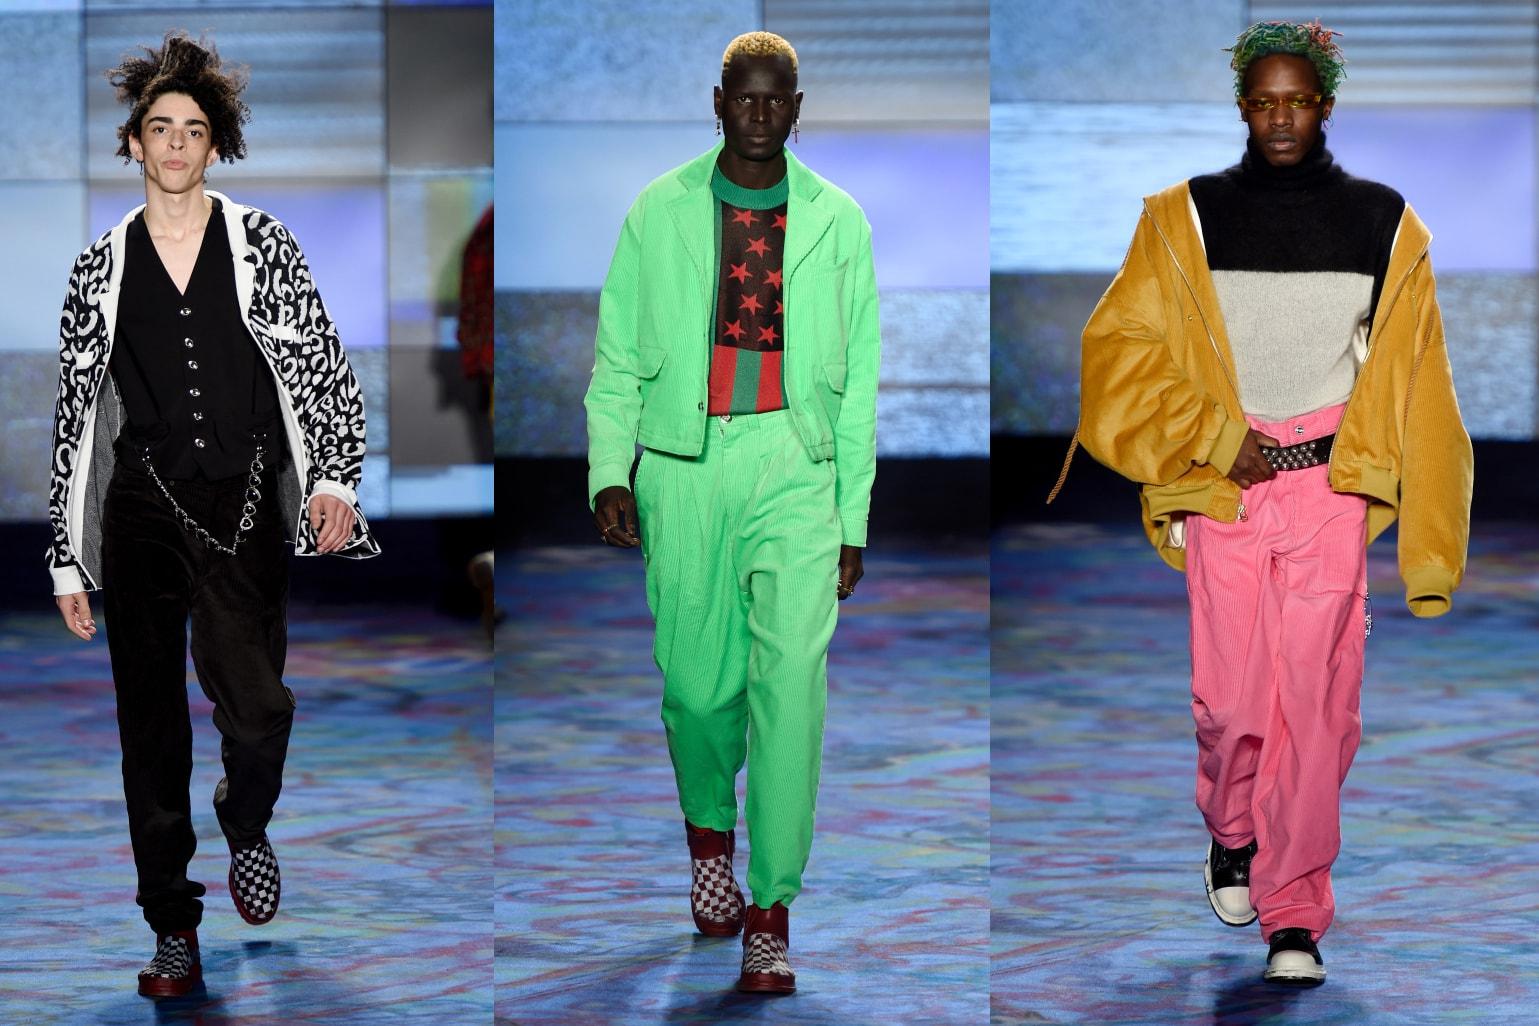 New York Fashion Week 2018 Fall Winter trend report list runway collection show raf simons calvin klein landlord coach 1941 tom ford eckhaus latta john elliot n hoolywood abasi rosborough c2h4